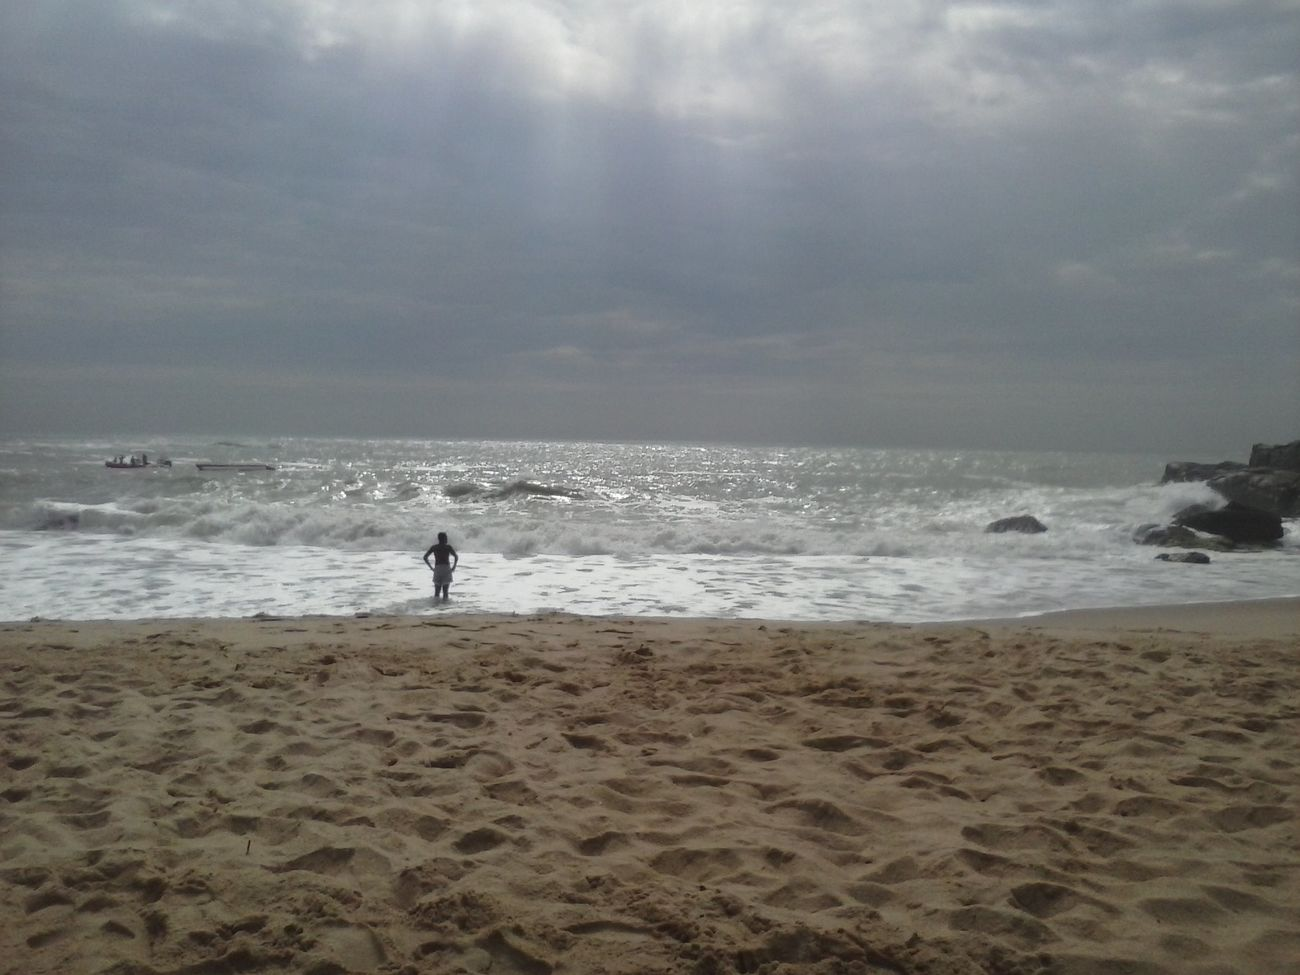 Pontodevista Rio De Janeiro Olhardebolso Praia